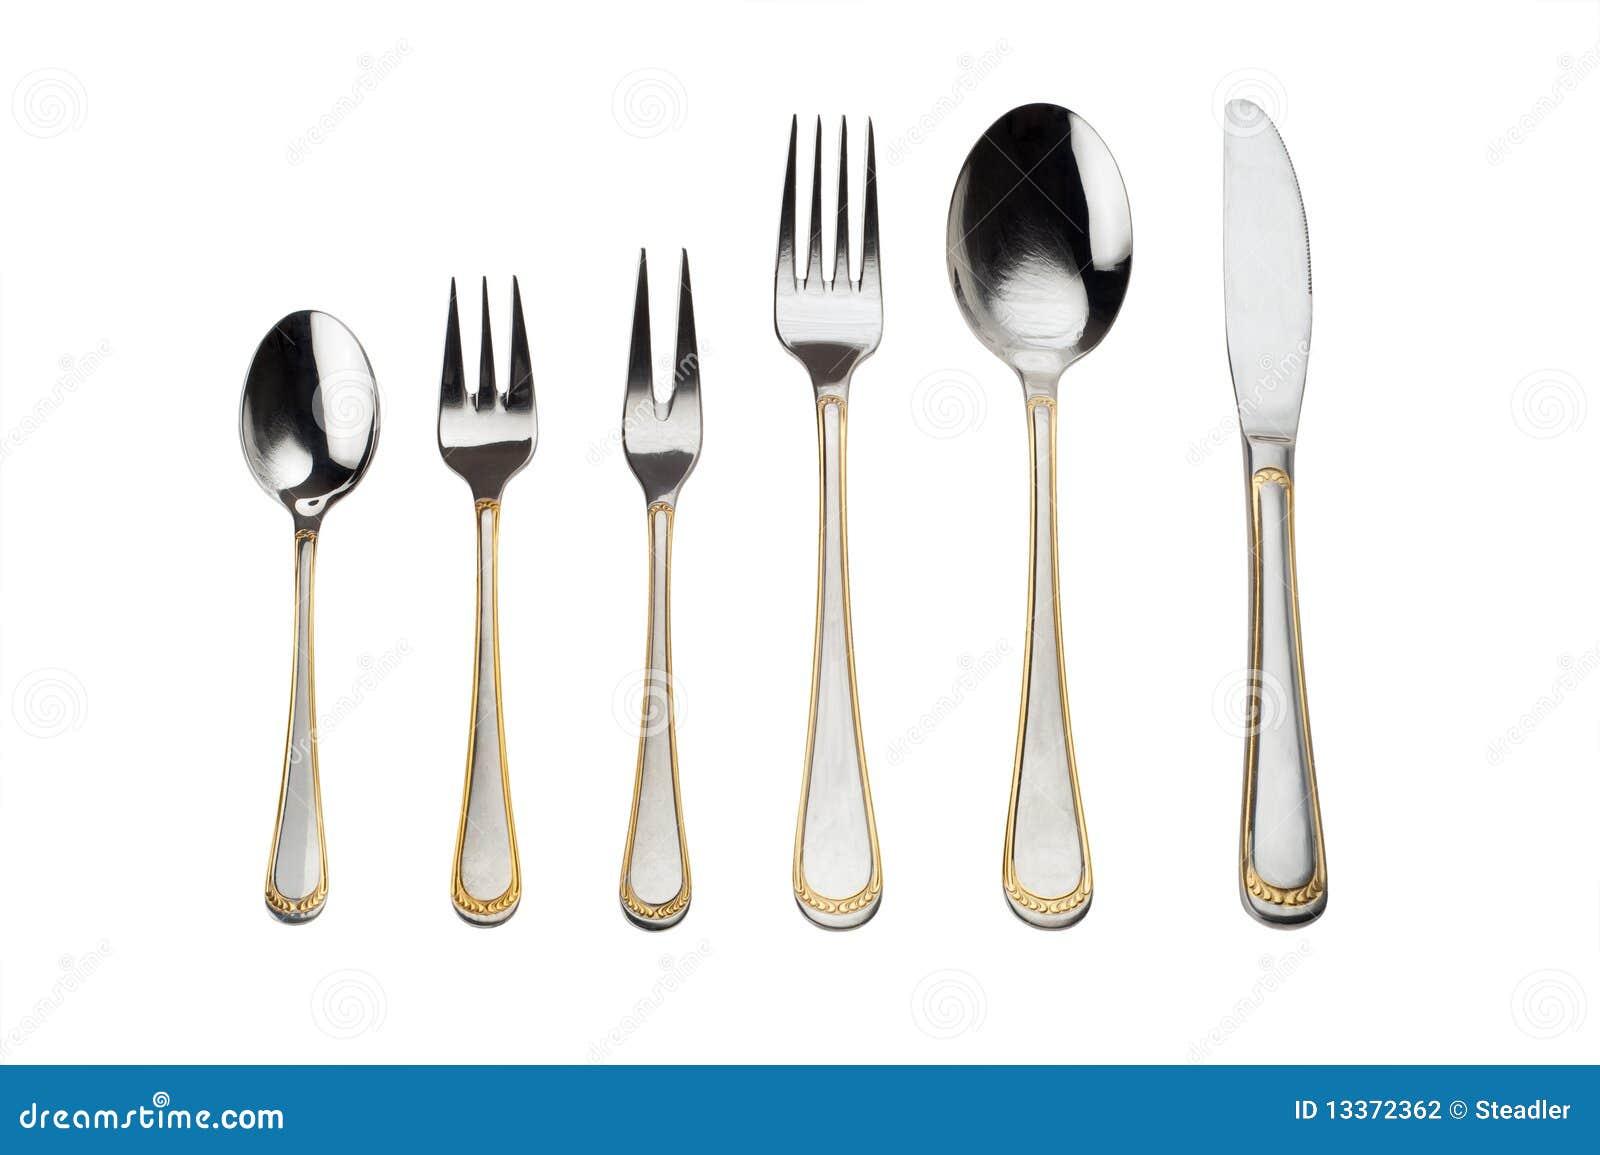 full set of silverware stock photography image 13372362